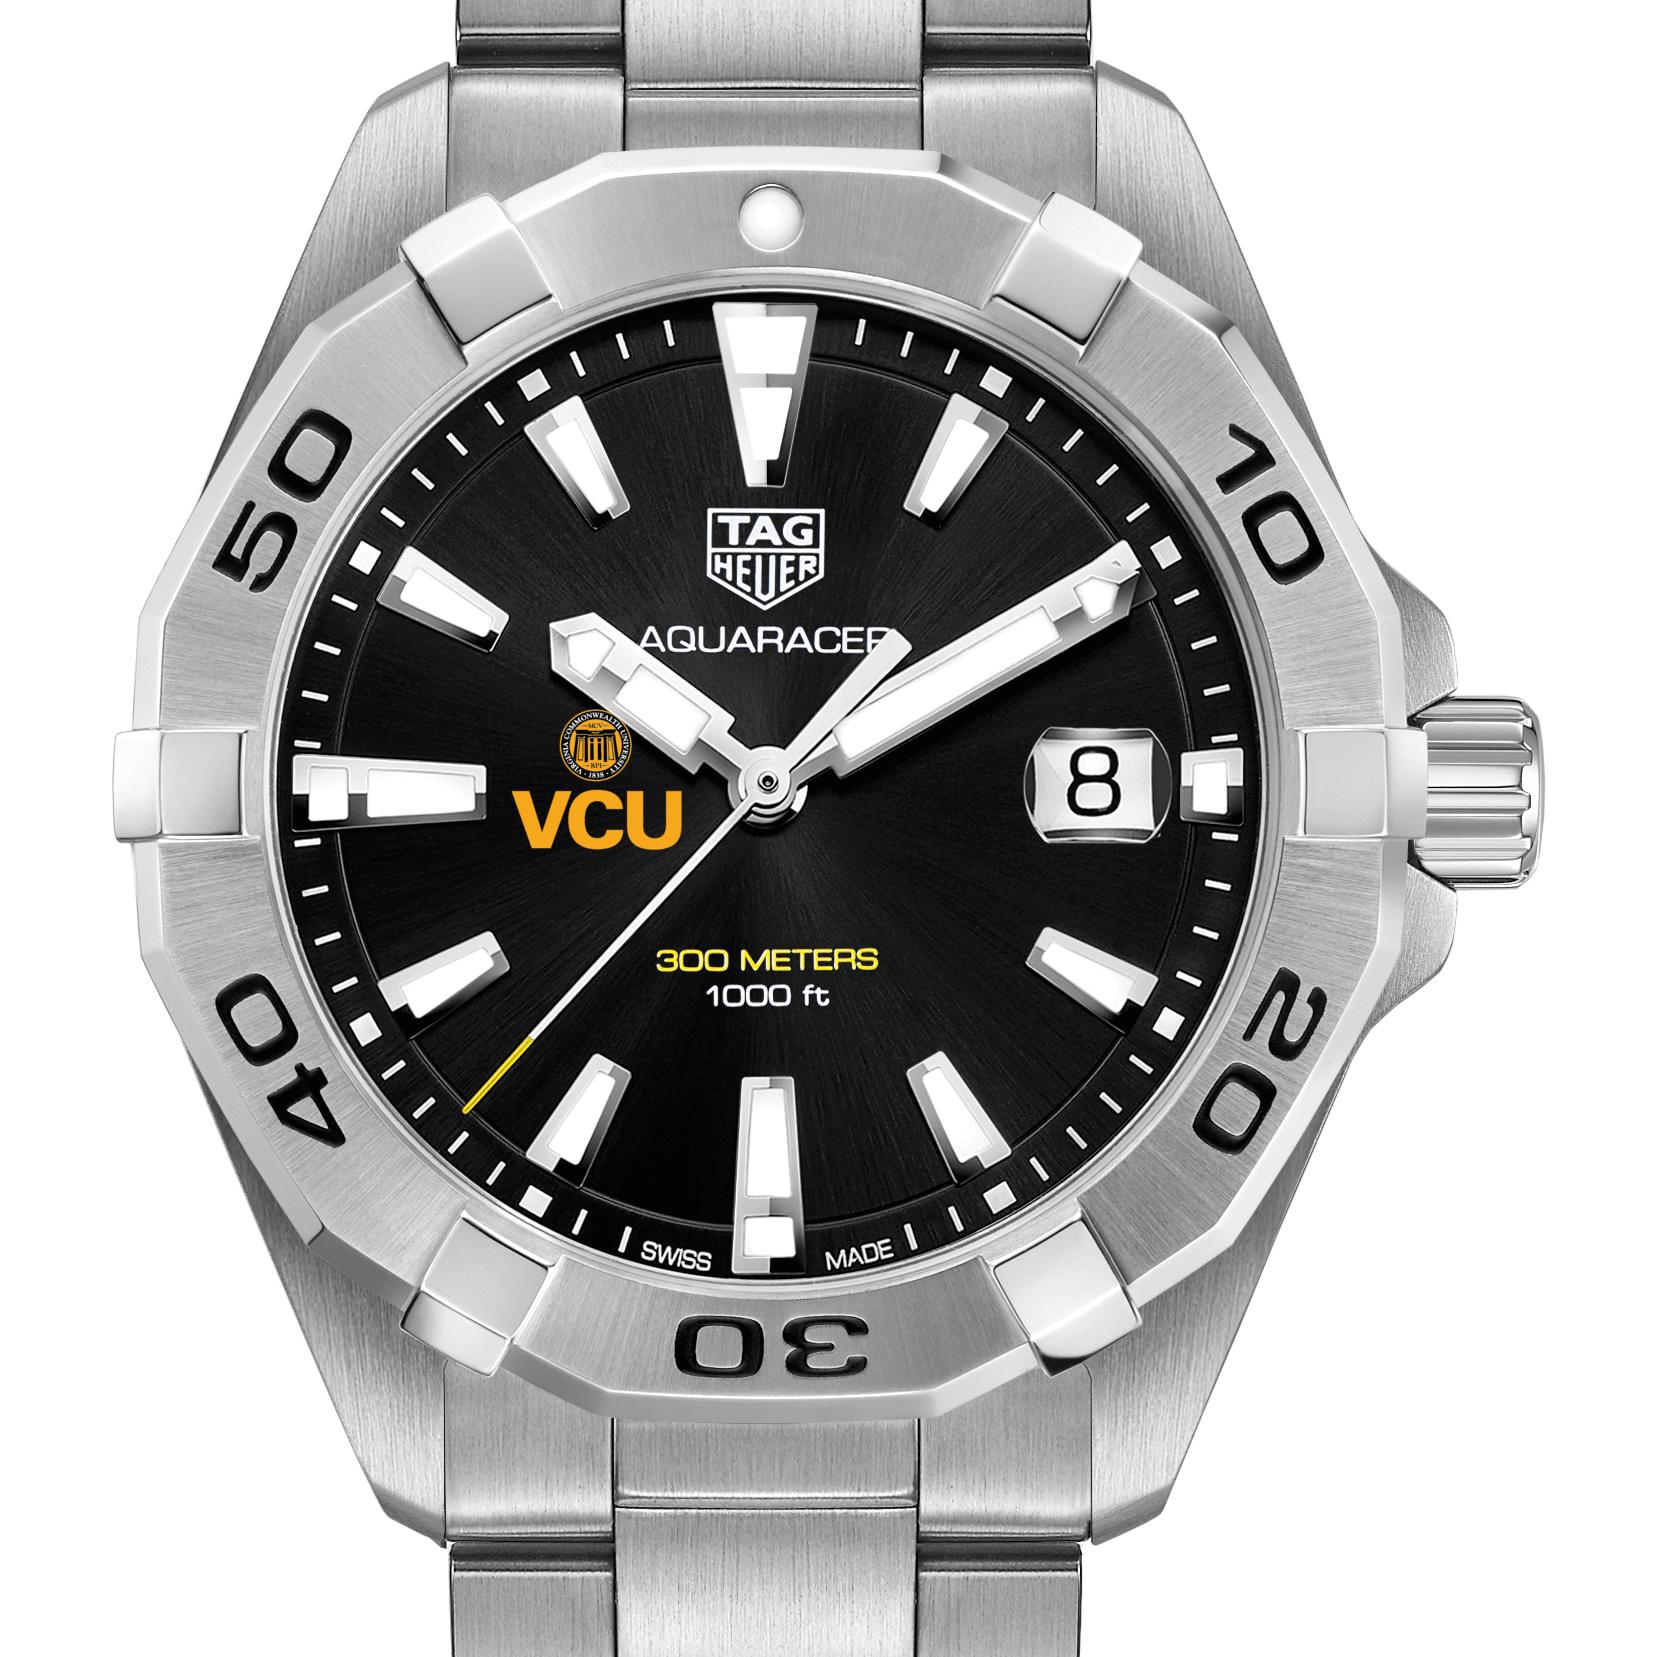 VCU Men's TAG Heuer Steel Aquaracer with Black Dial